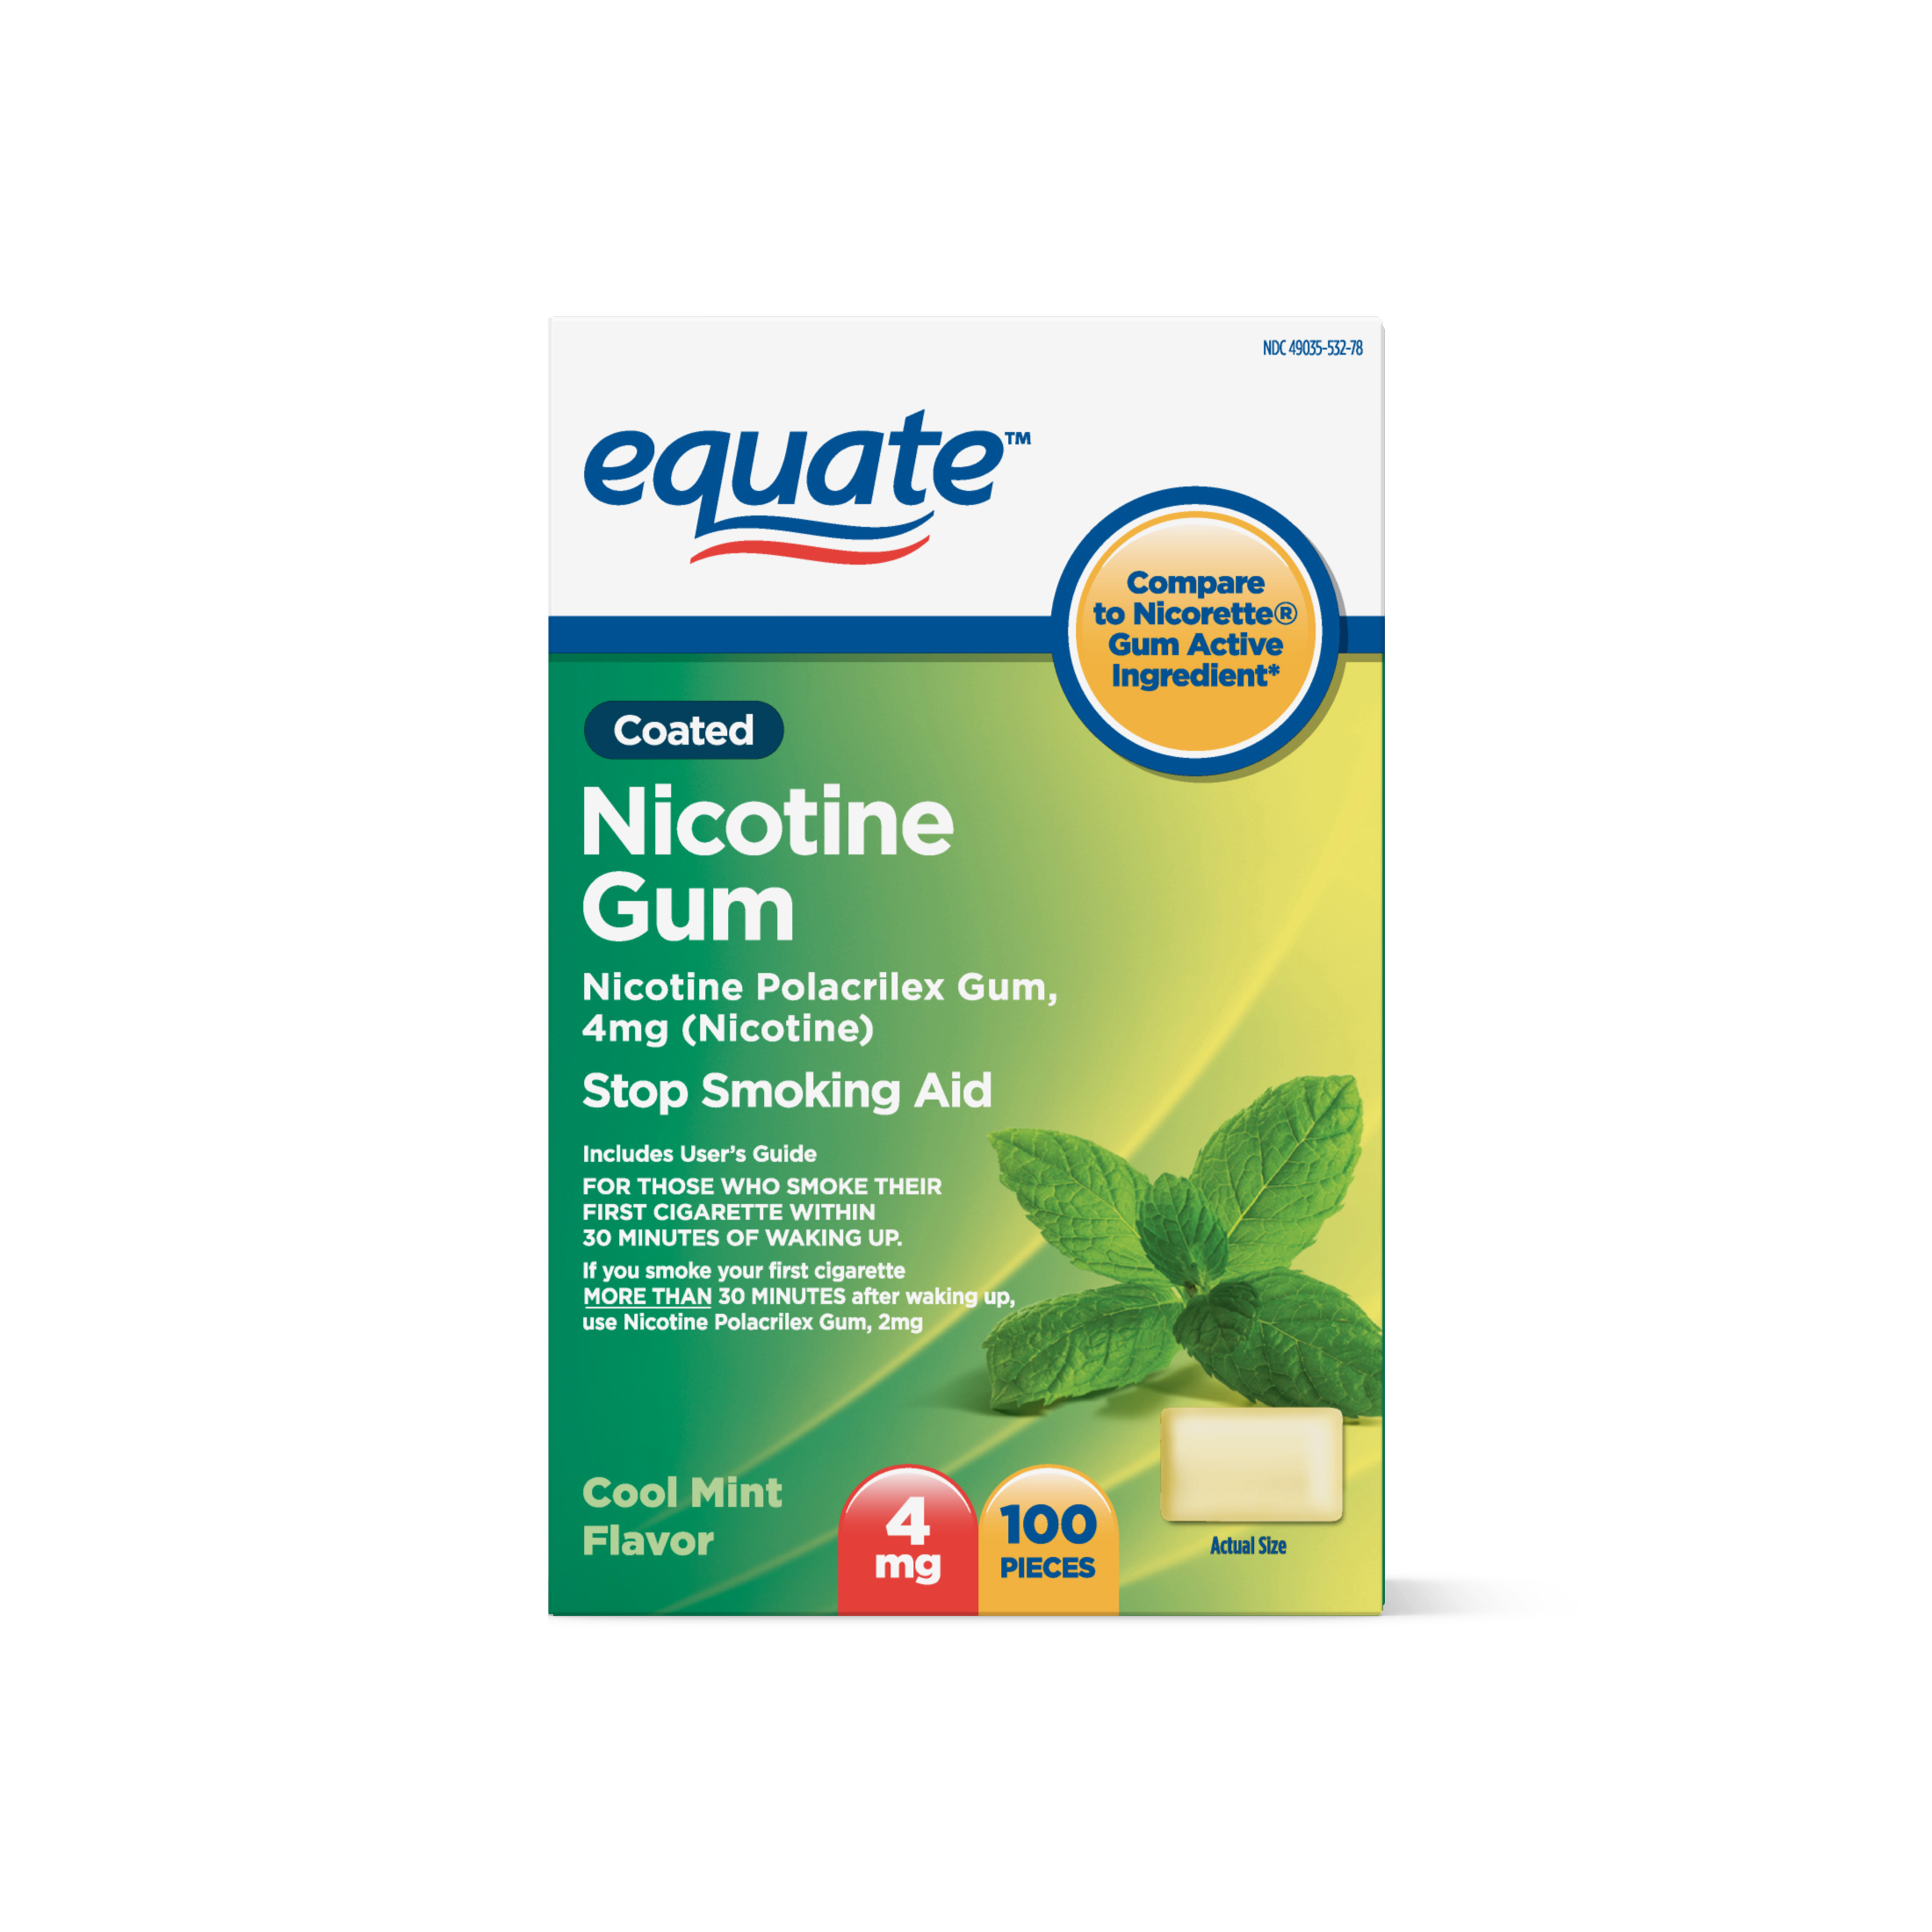 Equate Coated Nicotine Cool Mint Gum, 4 mg, 100 Ct